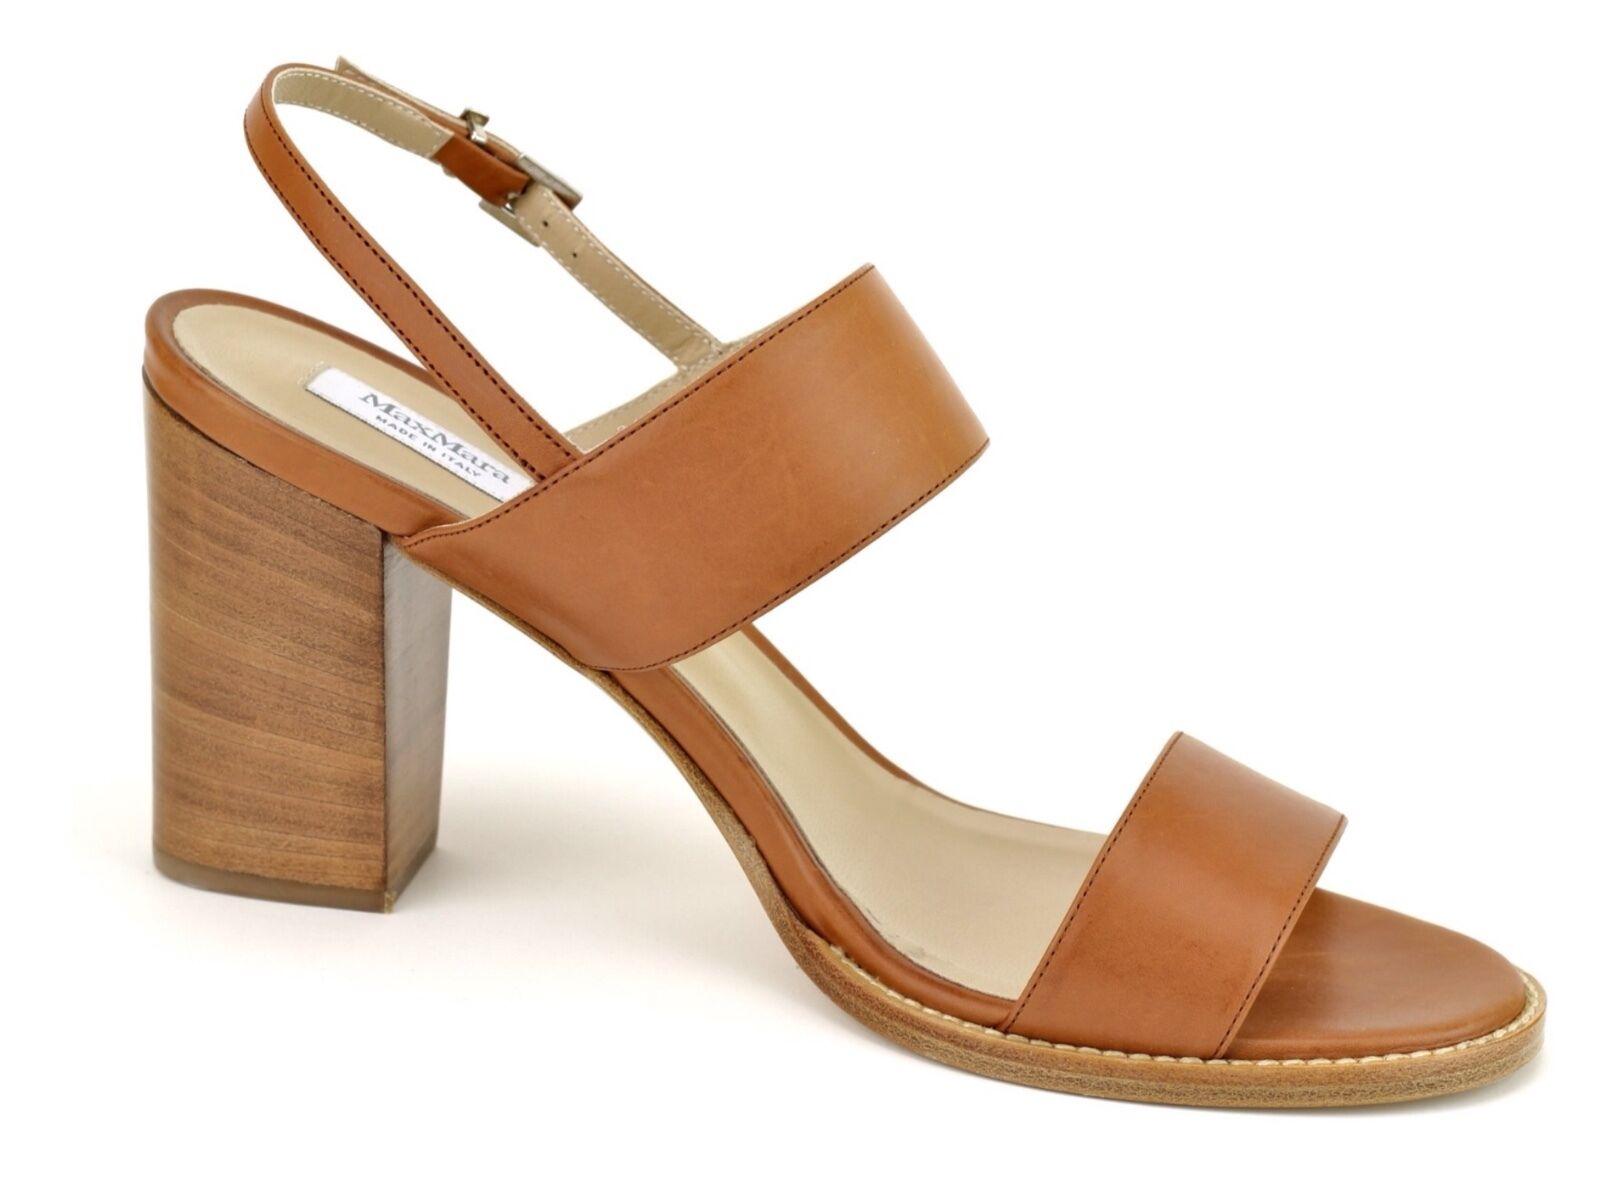 UGG Australia Beige Wool Blend T Strap Flip Flop Sandals Size 8 New